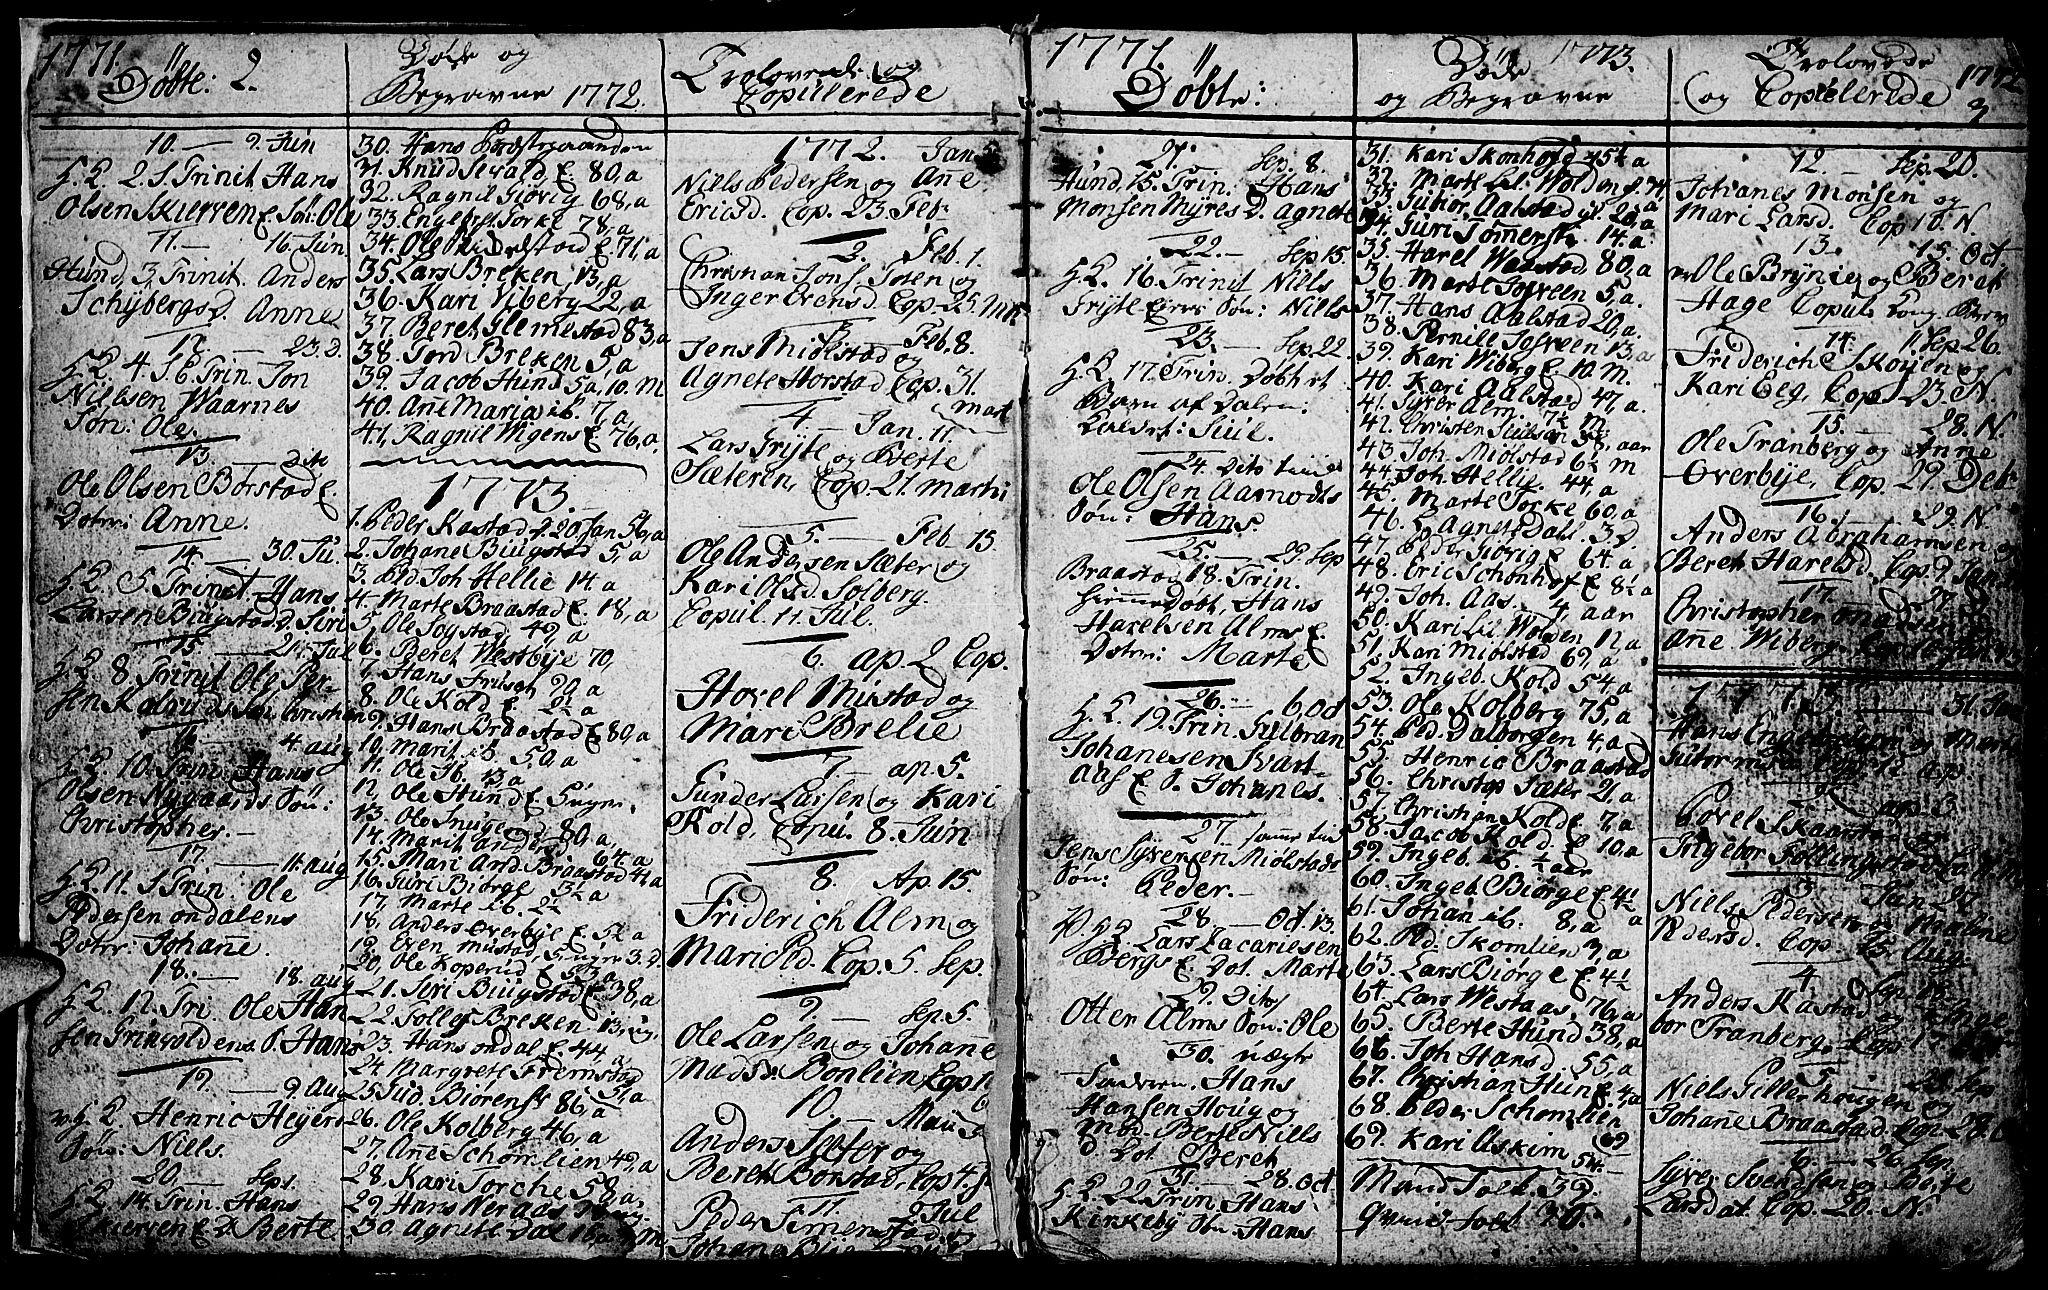 SAH, Vardal prestekontor, H/Ha/Hab/L0001: Klokkerbok nr. 1, 1771-1790, s. 2-3